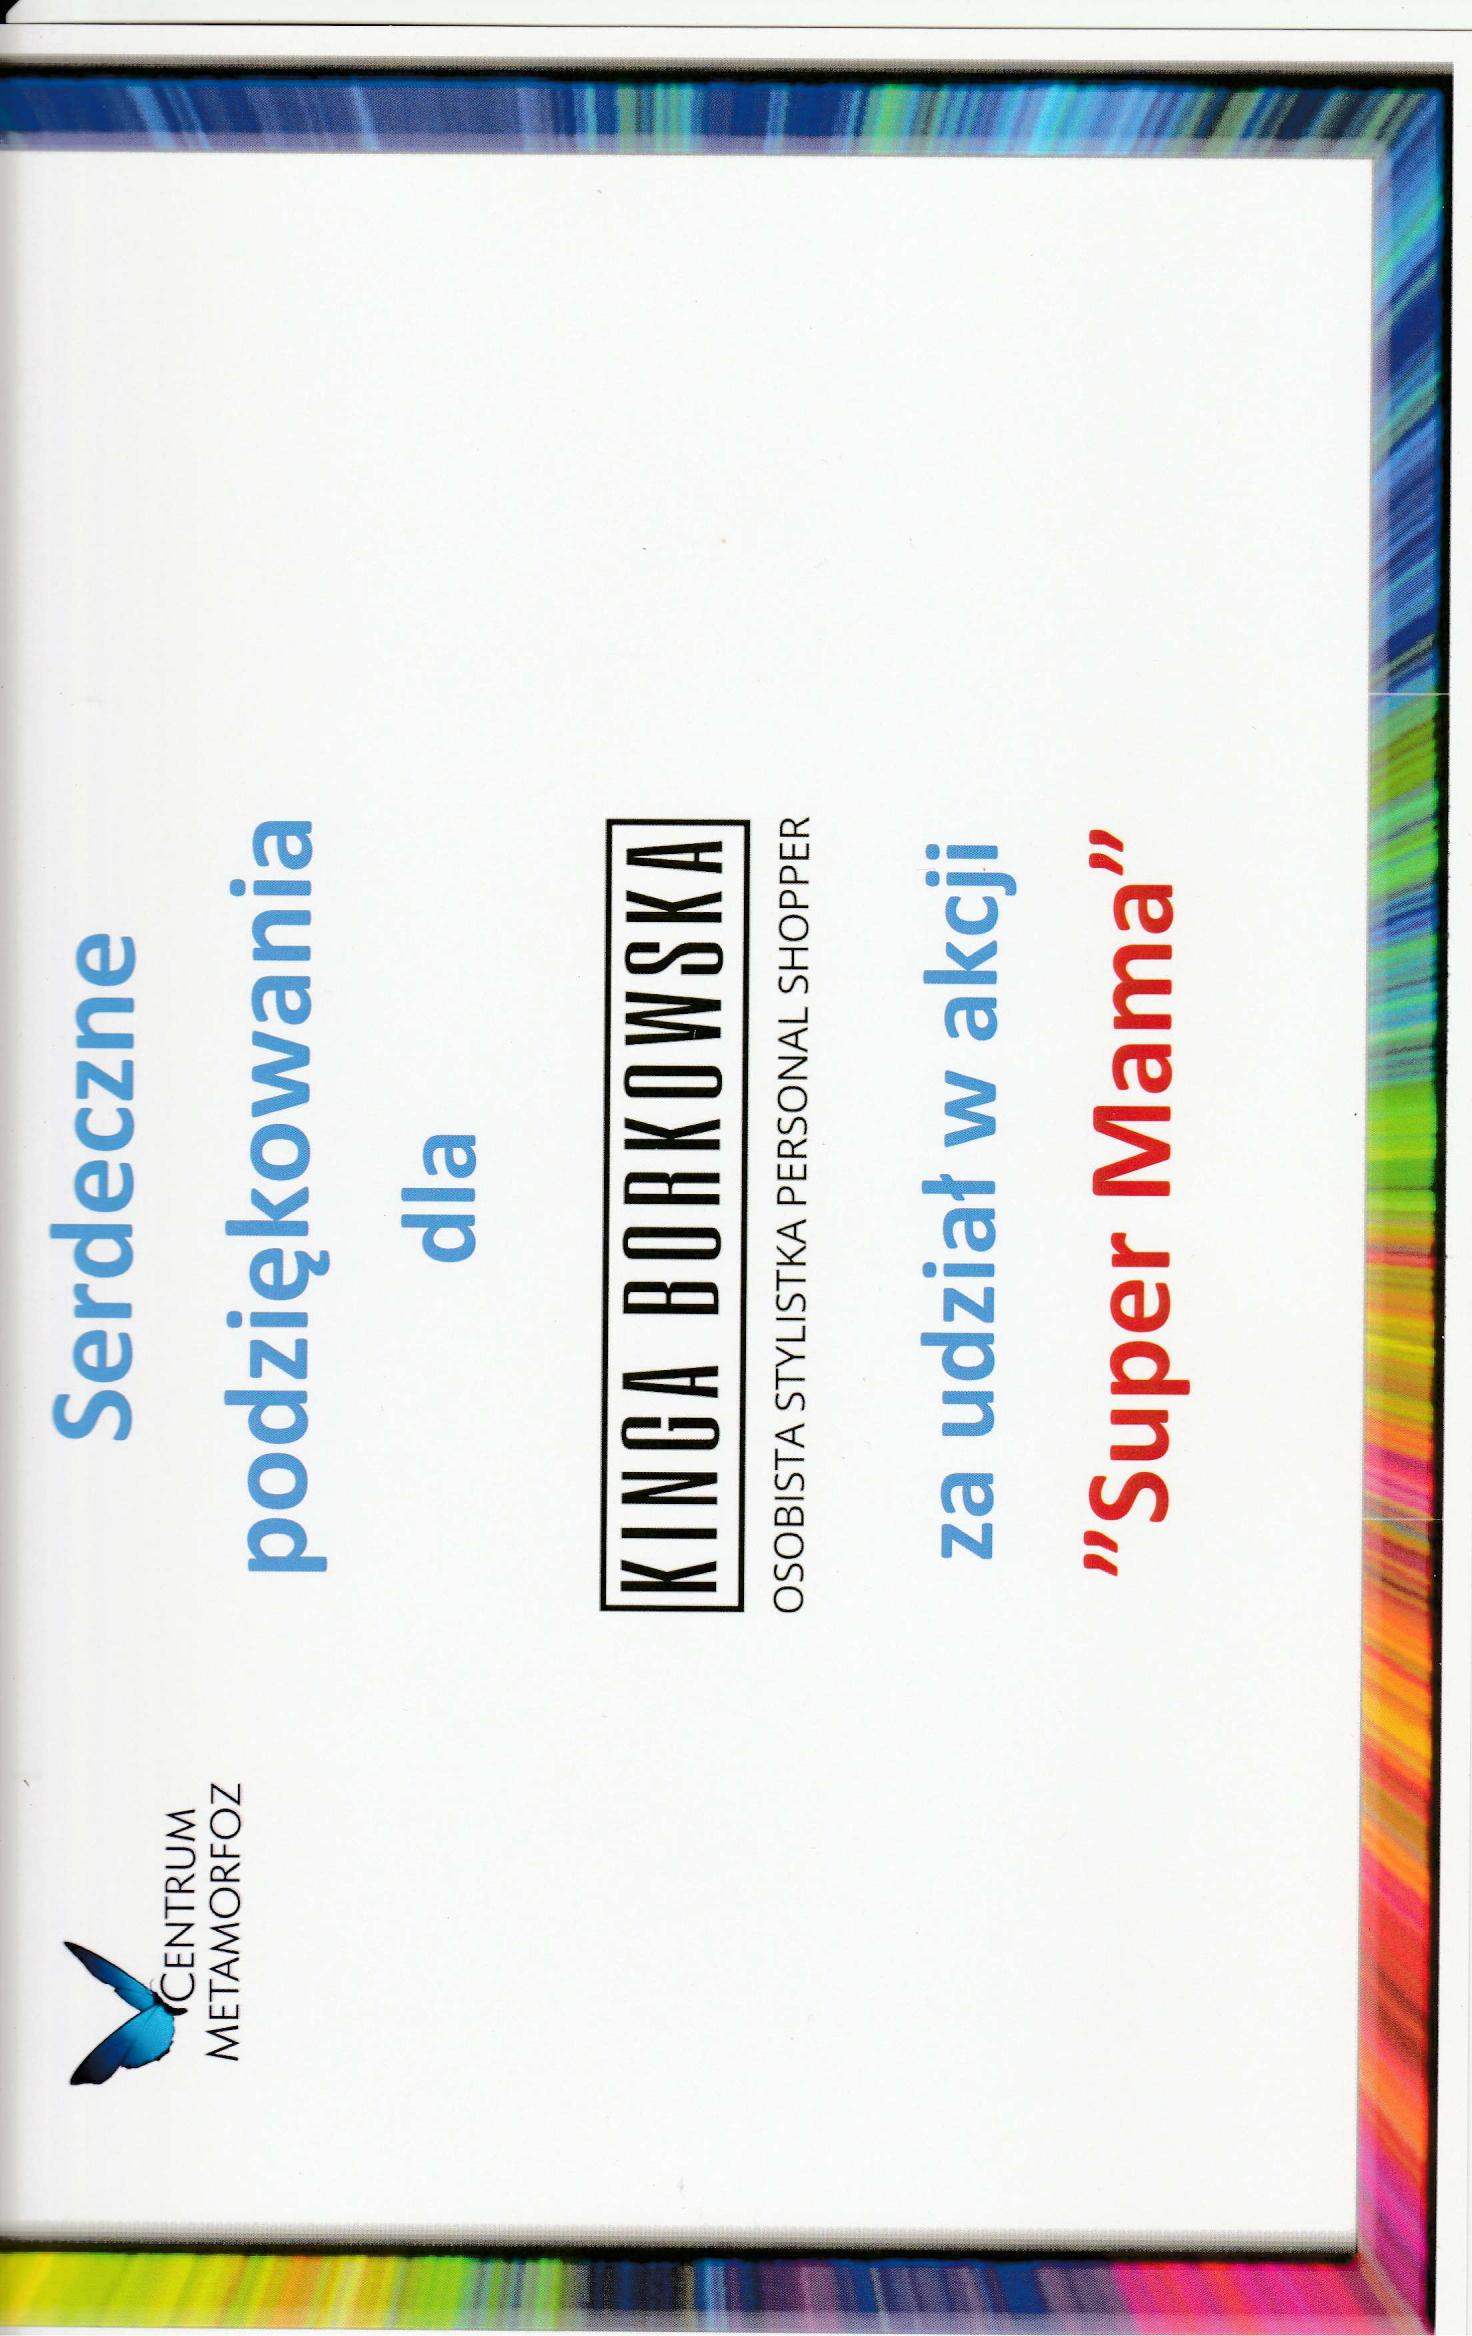 IMG_20180129_0003-1